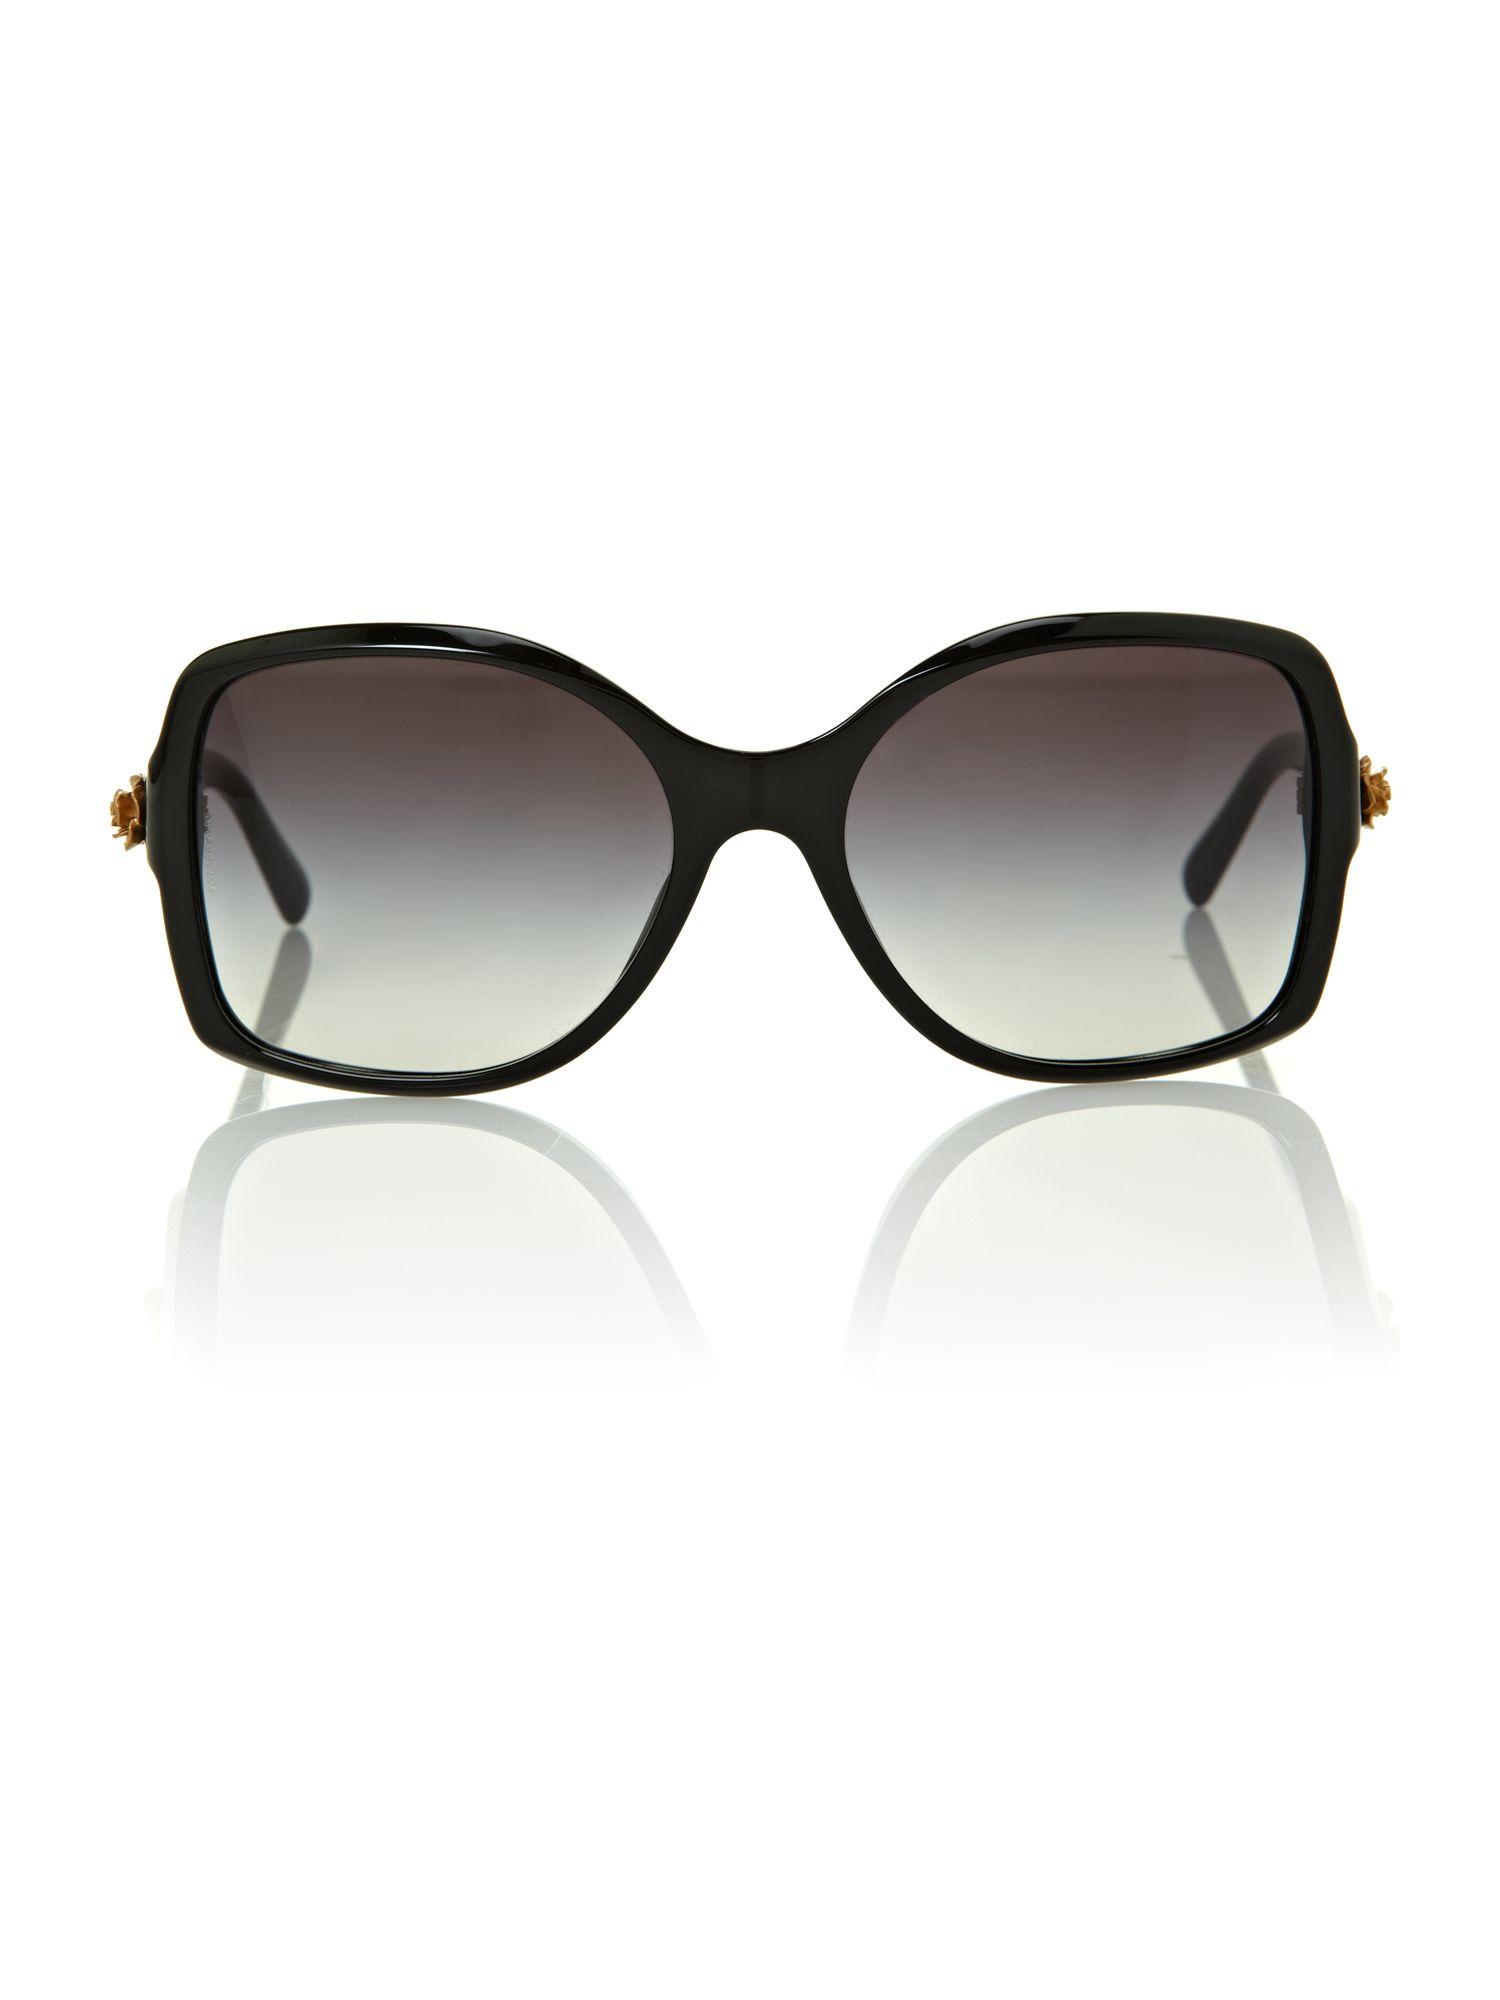 Dolce & Gabbana Ladies Black Square Sunglasses